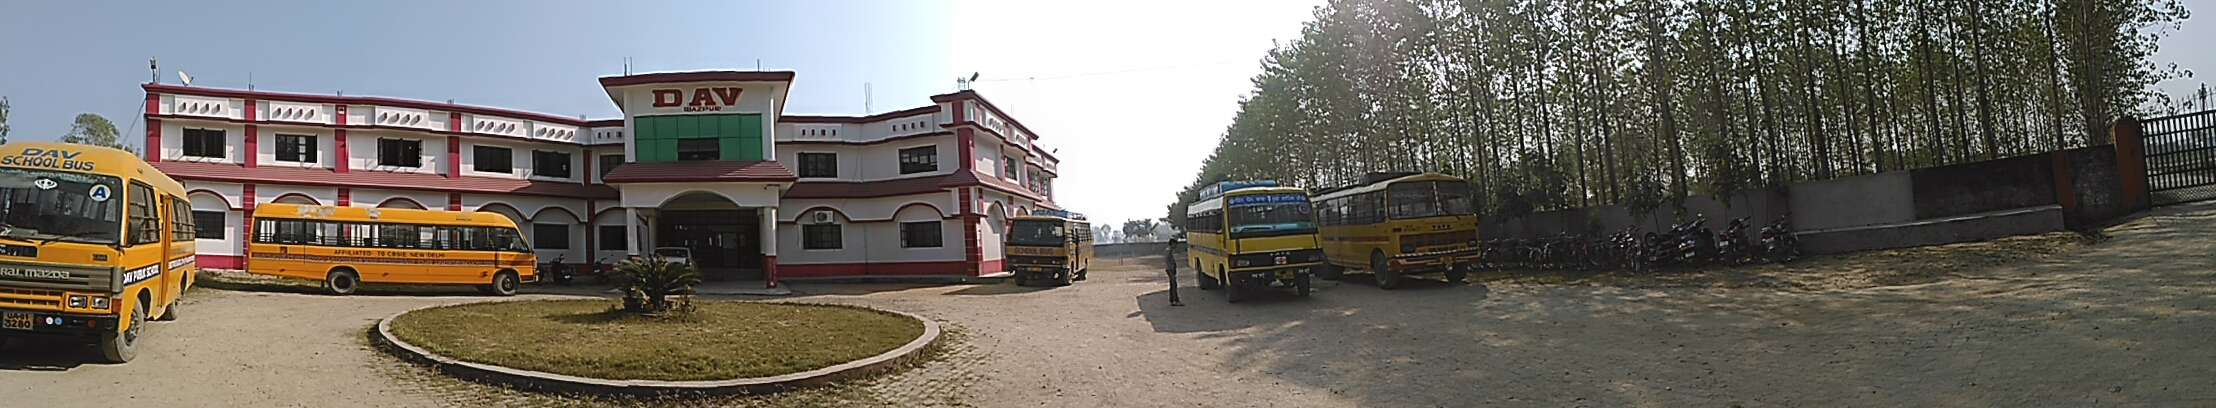 DAV Public School Bazpur Beria Road 3530245